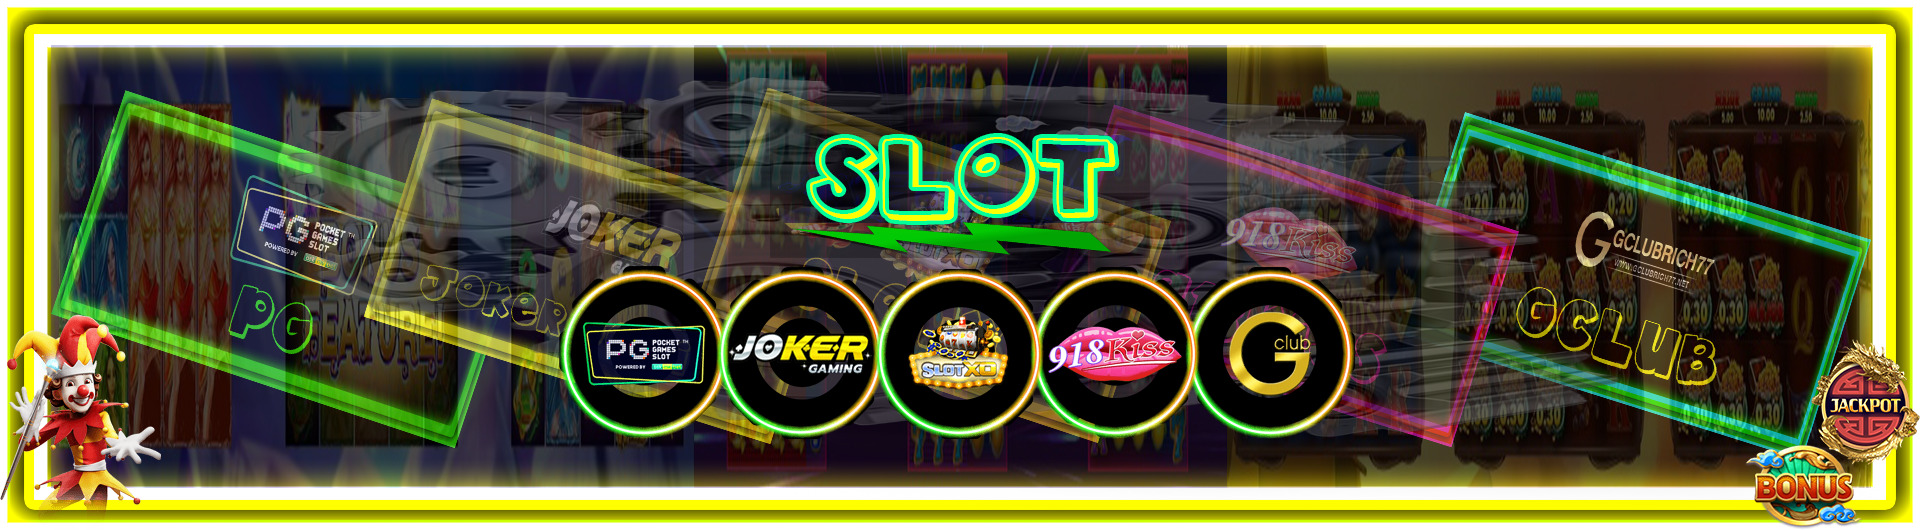 SLOT เกมคาสิโนออนไลน์ SLOTXO